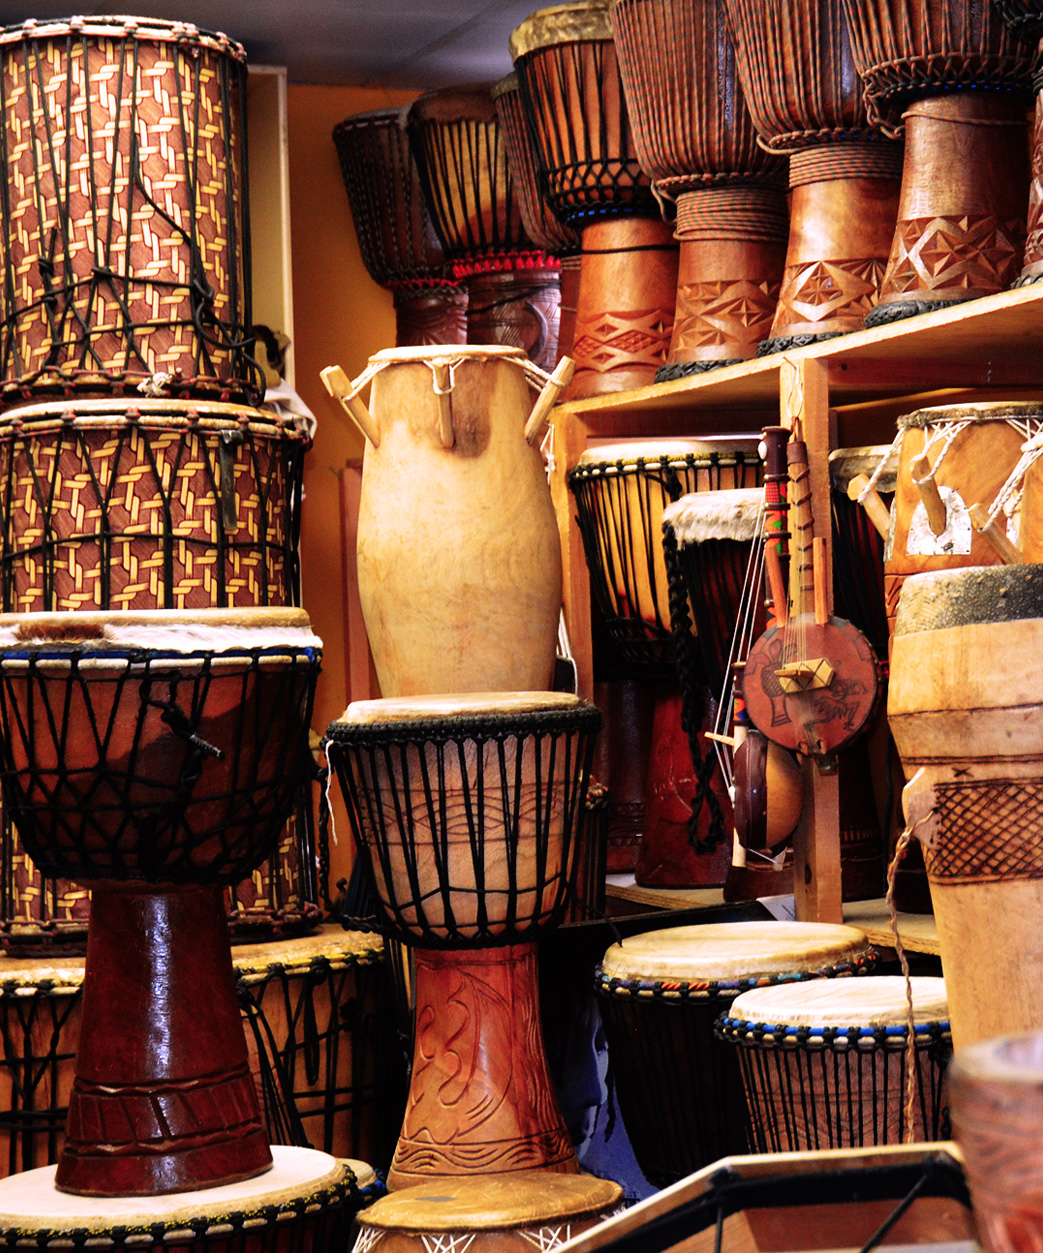 African Drums and Art Crafts Saikou Kensington Market Dundas St West Toronto Canada Shop Workshops Lessons Classes Masks Furniture Fabric Drum Circles Crafts Performances Shows Entertainment